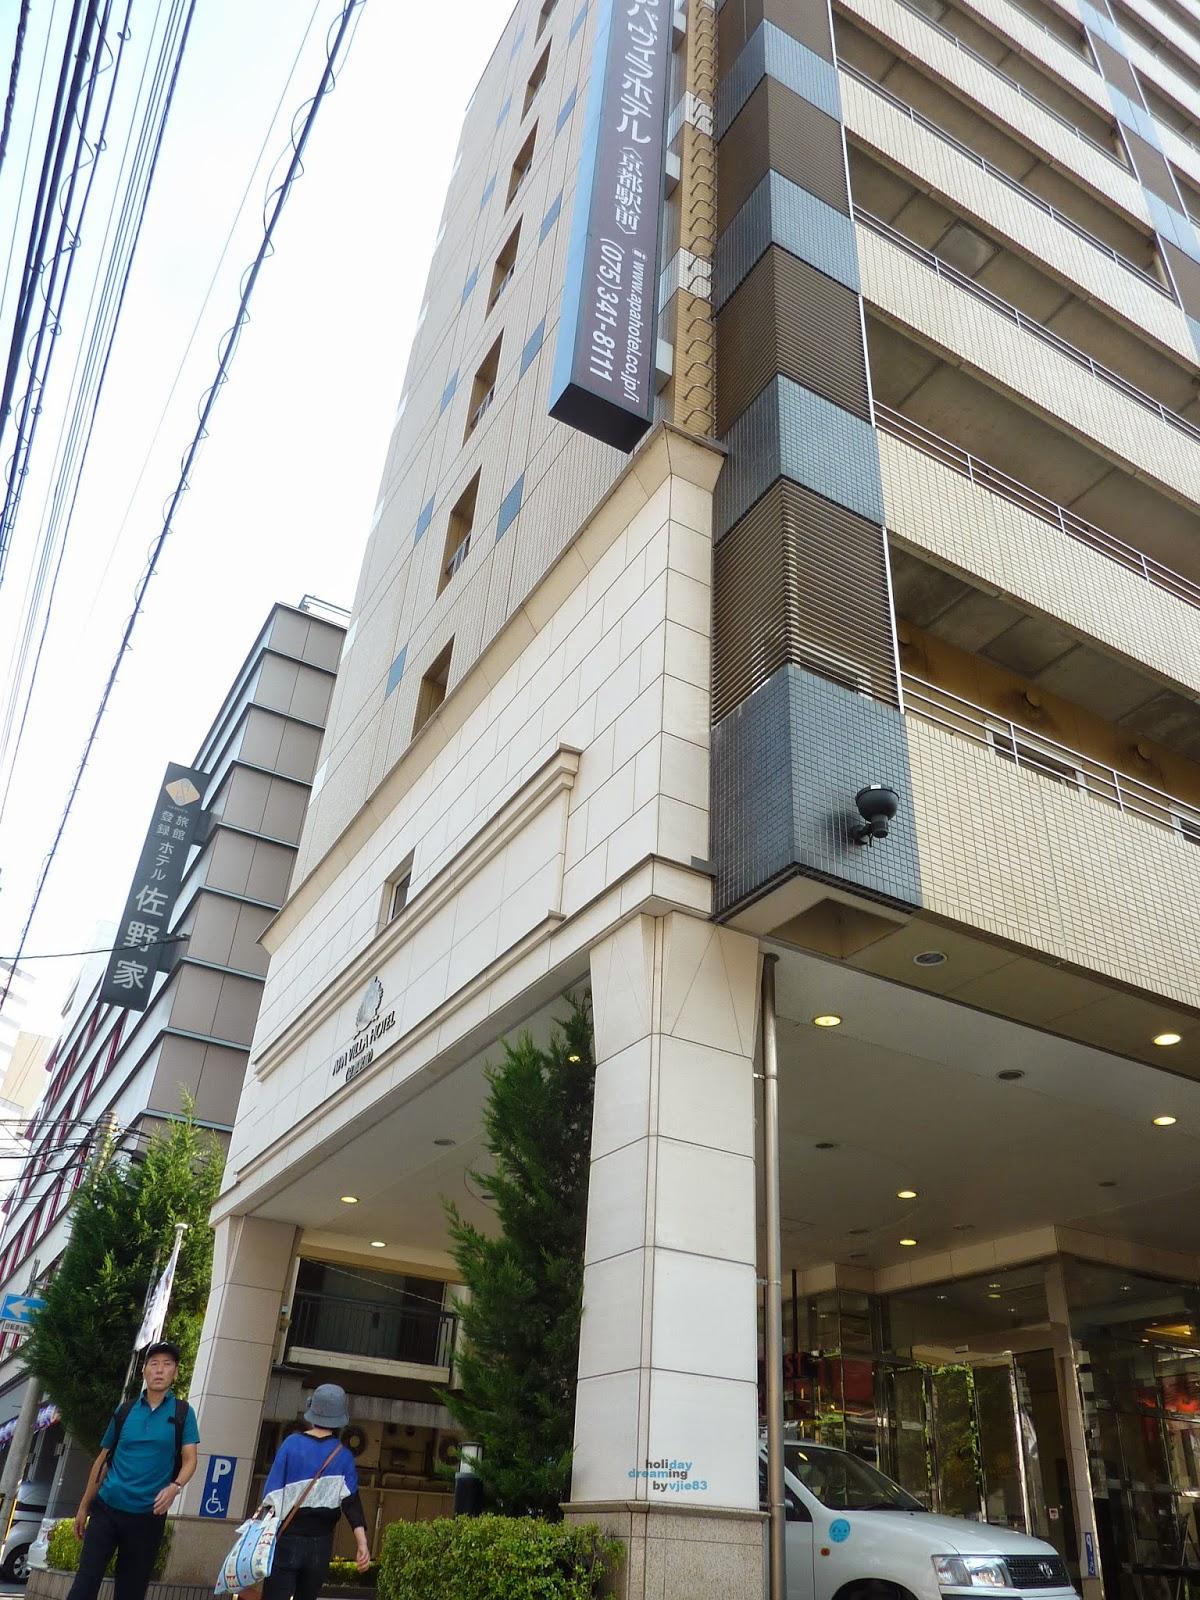 apa villa hotel kyoto ekimae review